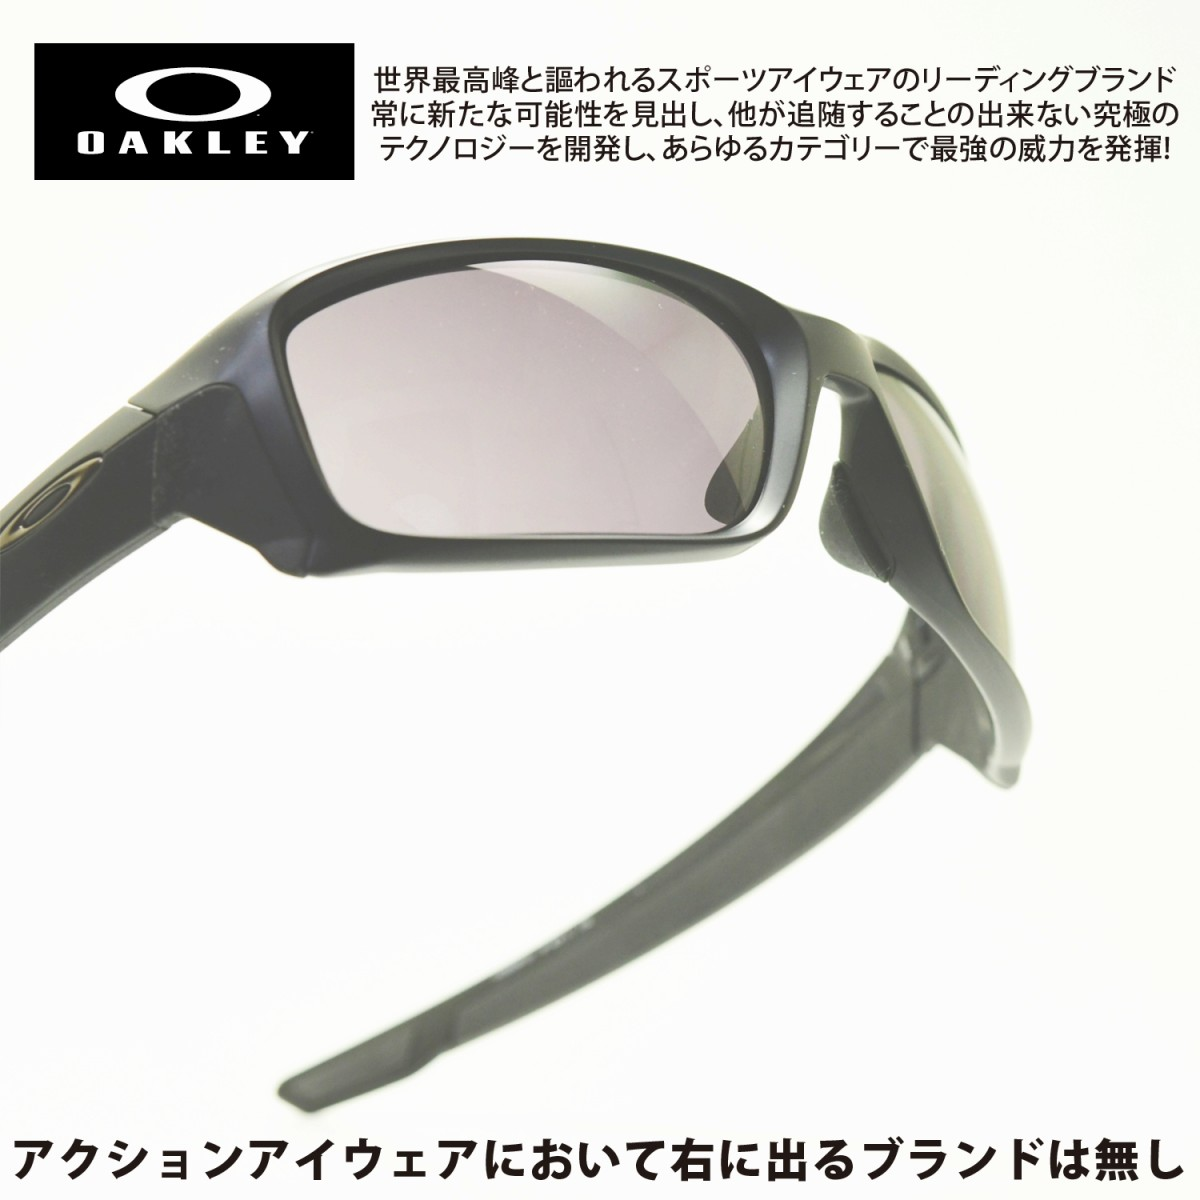 OAKLEY オークリーSTRAIGHTLINK ストレートリンク OO9336-03MATTE BLACK/WARM GREY